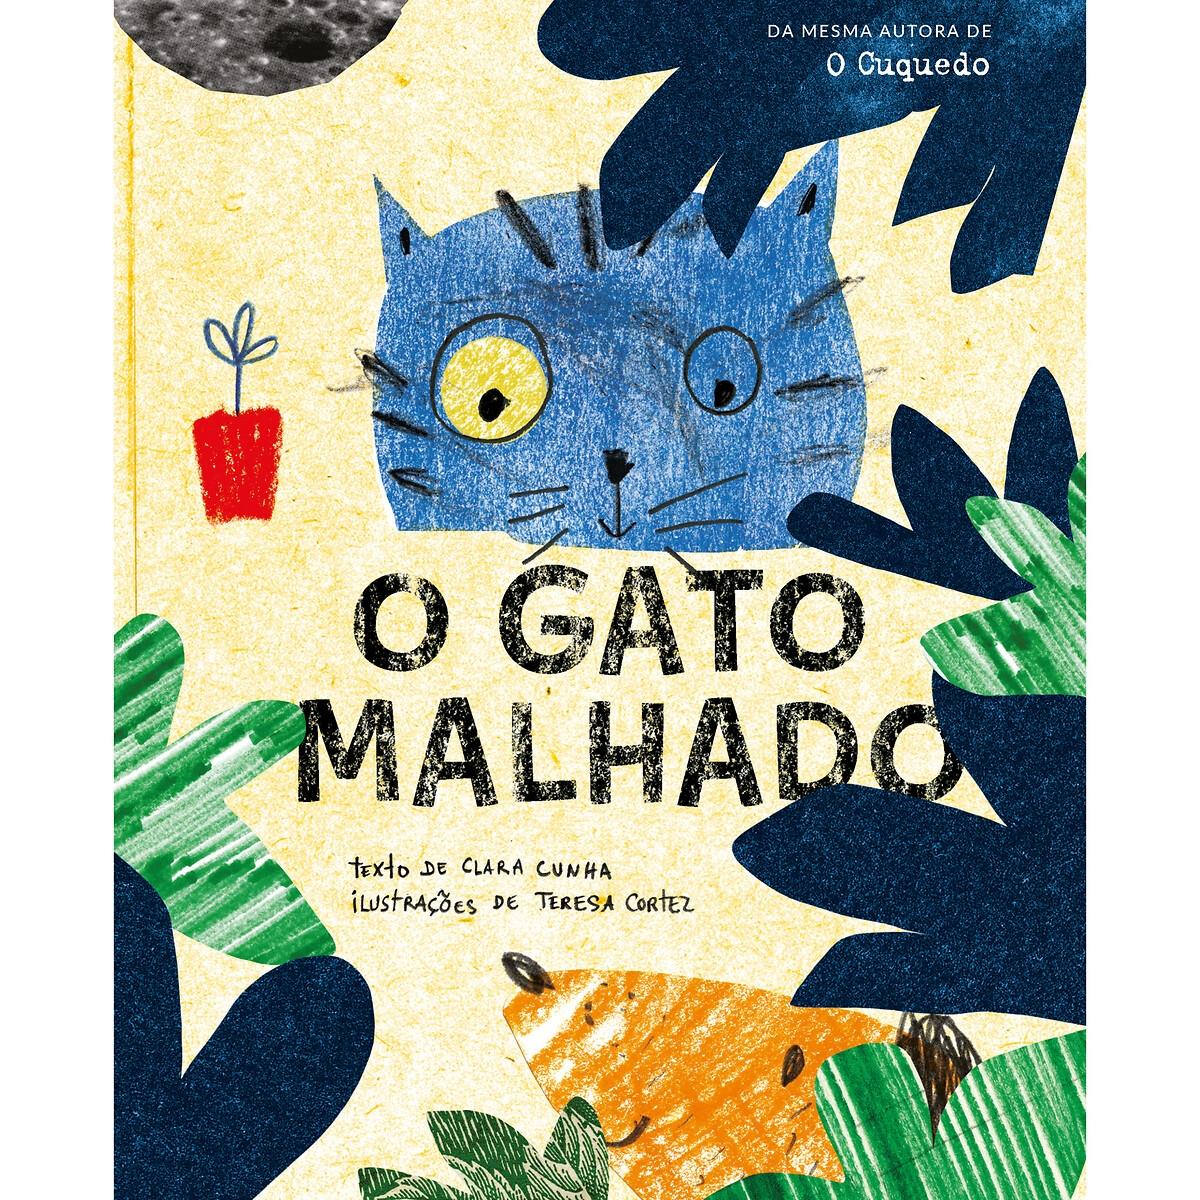 LIVROS HORIZONTE - Livros Horizonte Livro O Gato Malhado